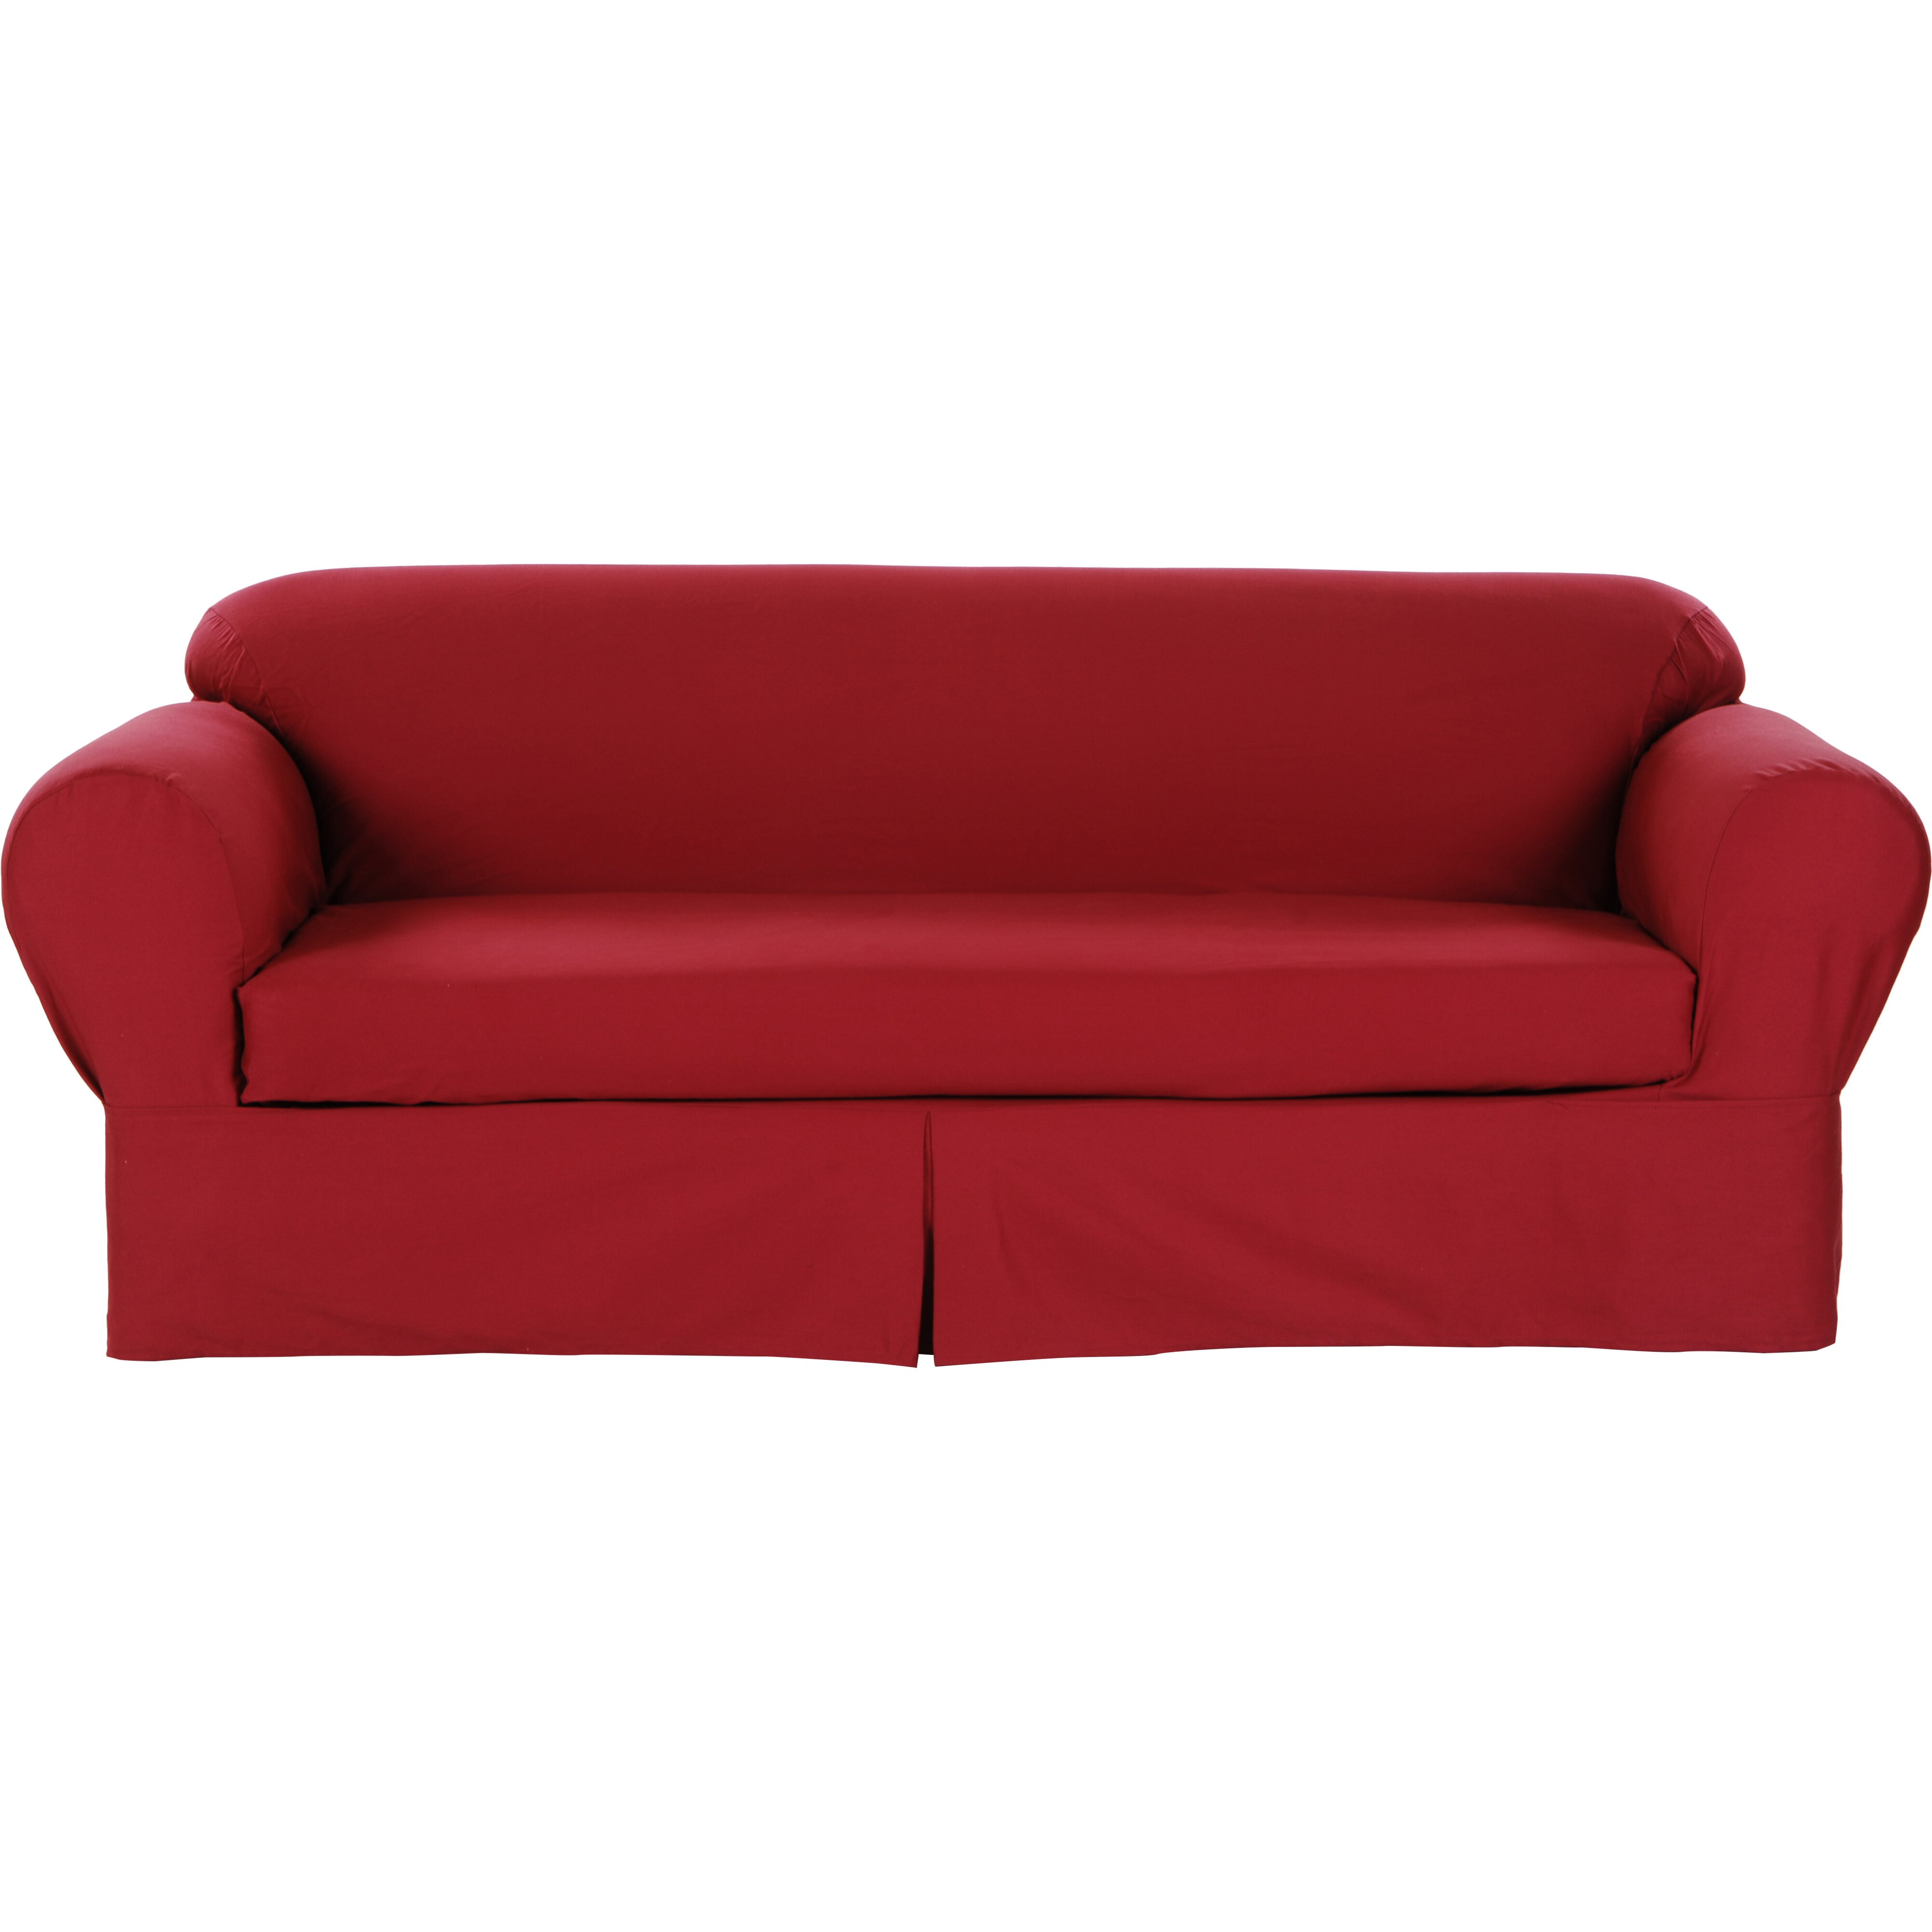 Darby Home Co Sofa Slipcover Reviews Wayfair